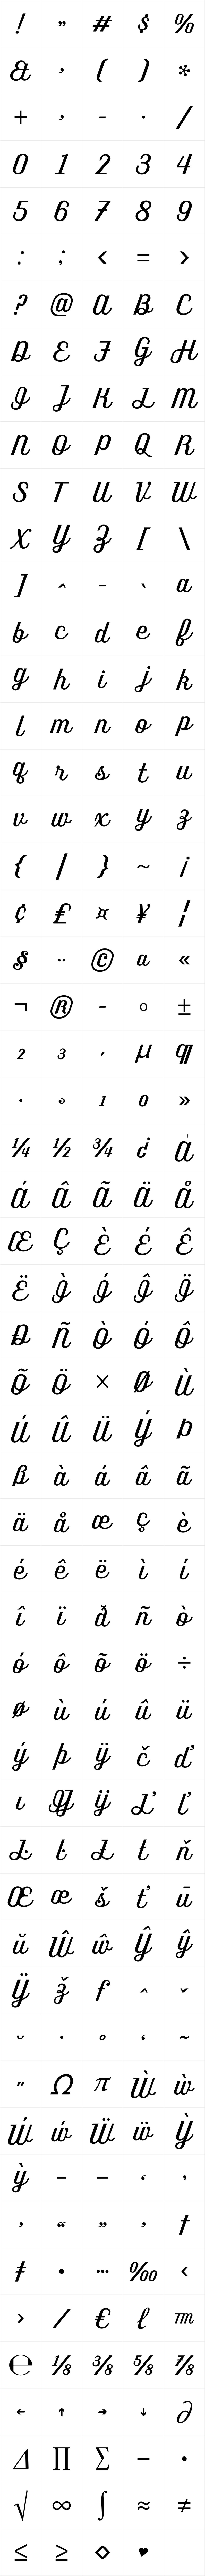 Benson Script No 20